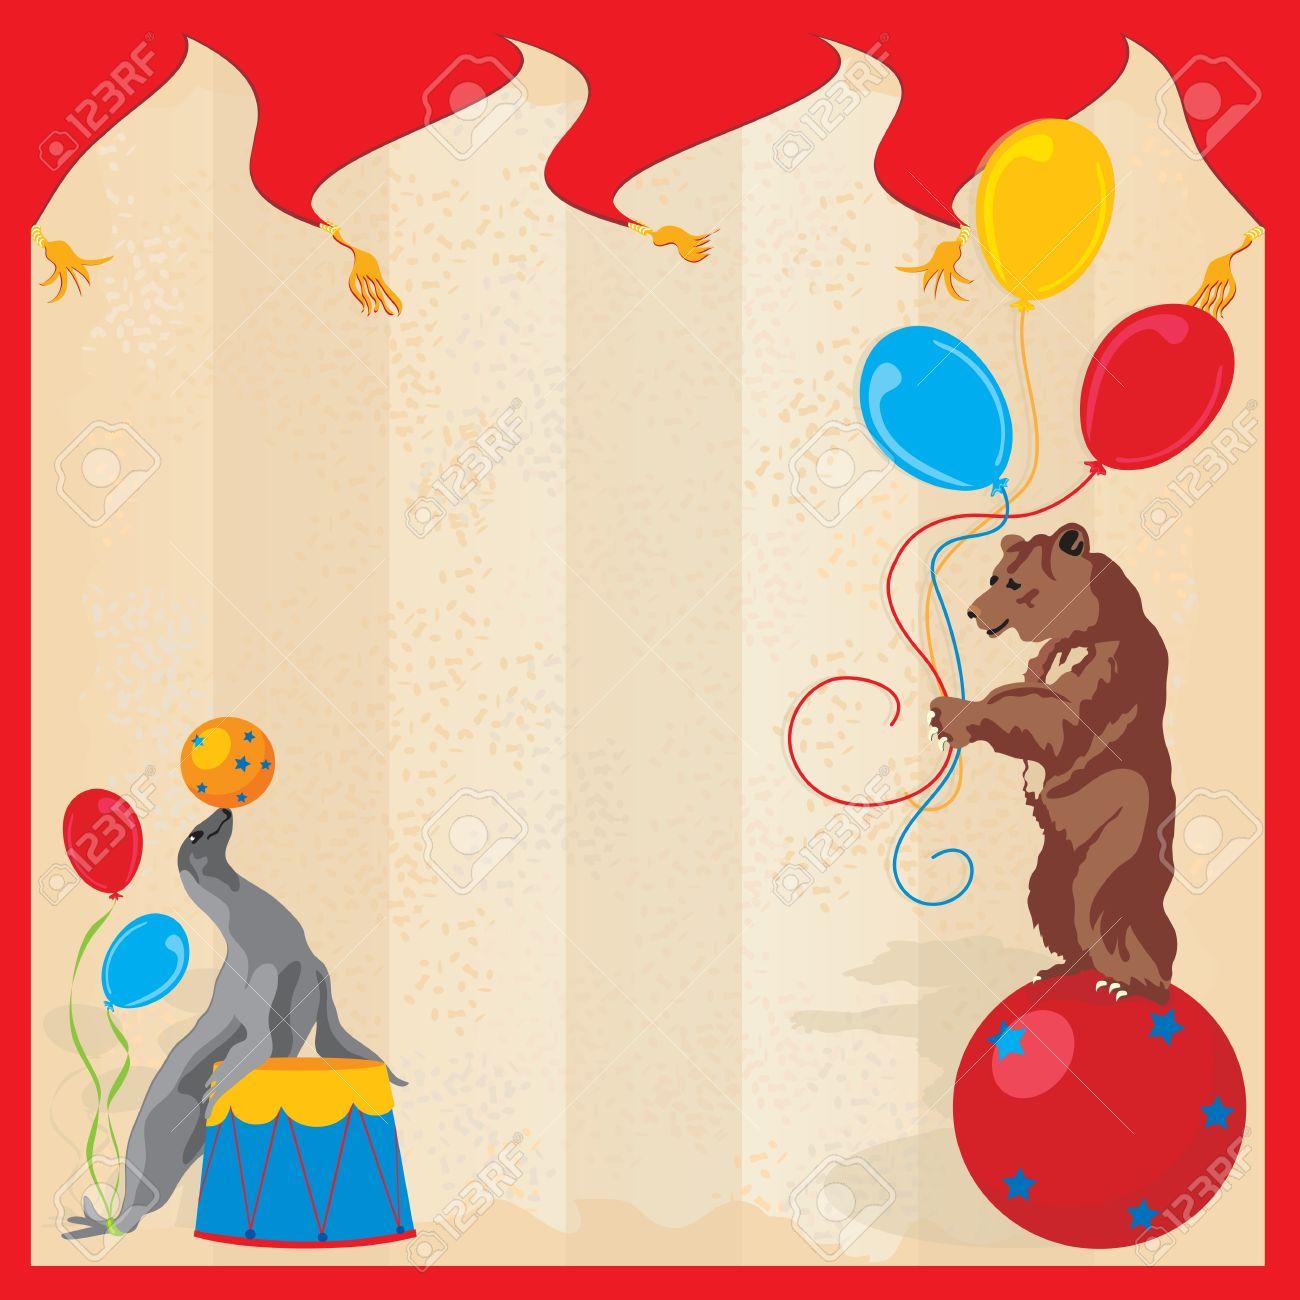 Performing Animals Circus Birthday Party Invitation Royalty Free